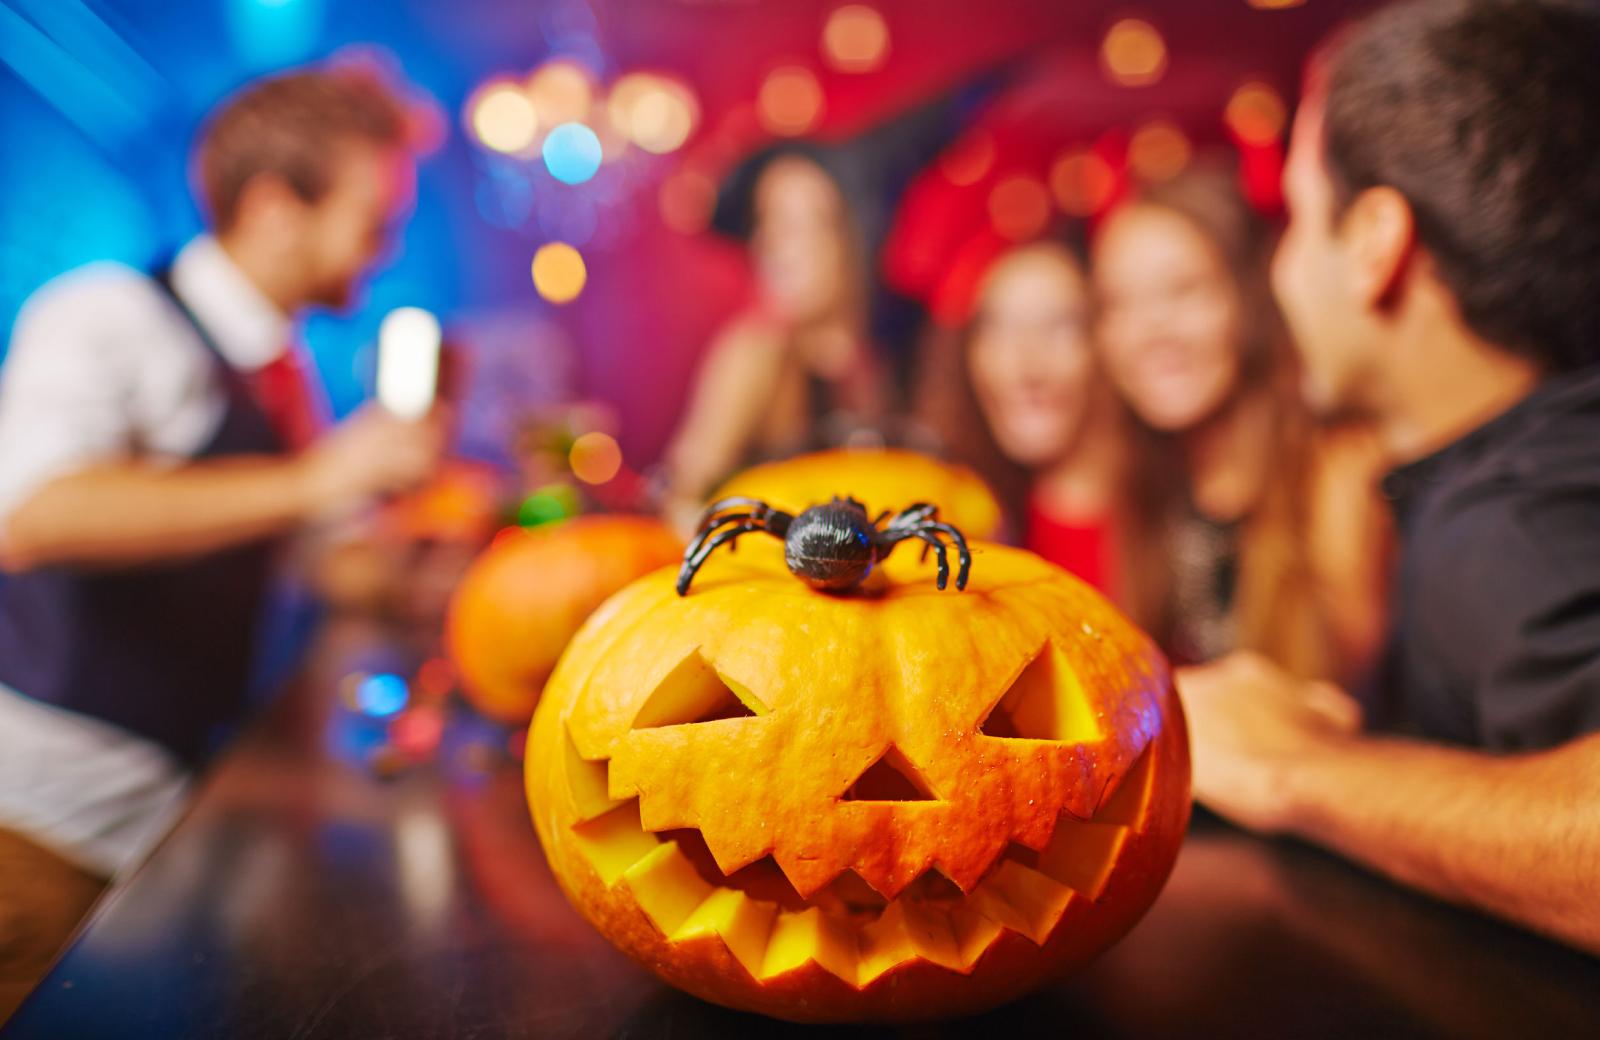 Stamford Halloween Celebration - The Waypointe Apts